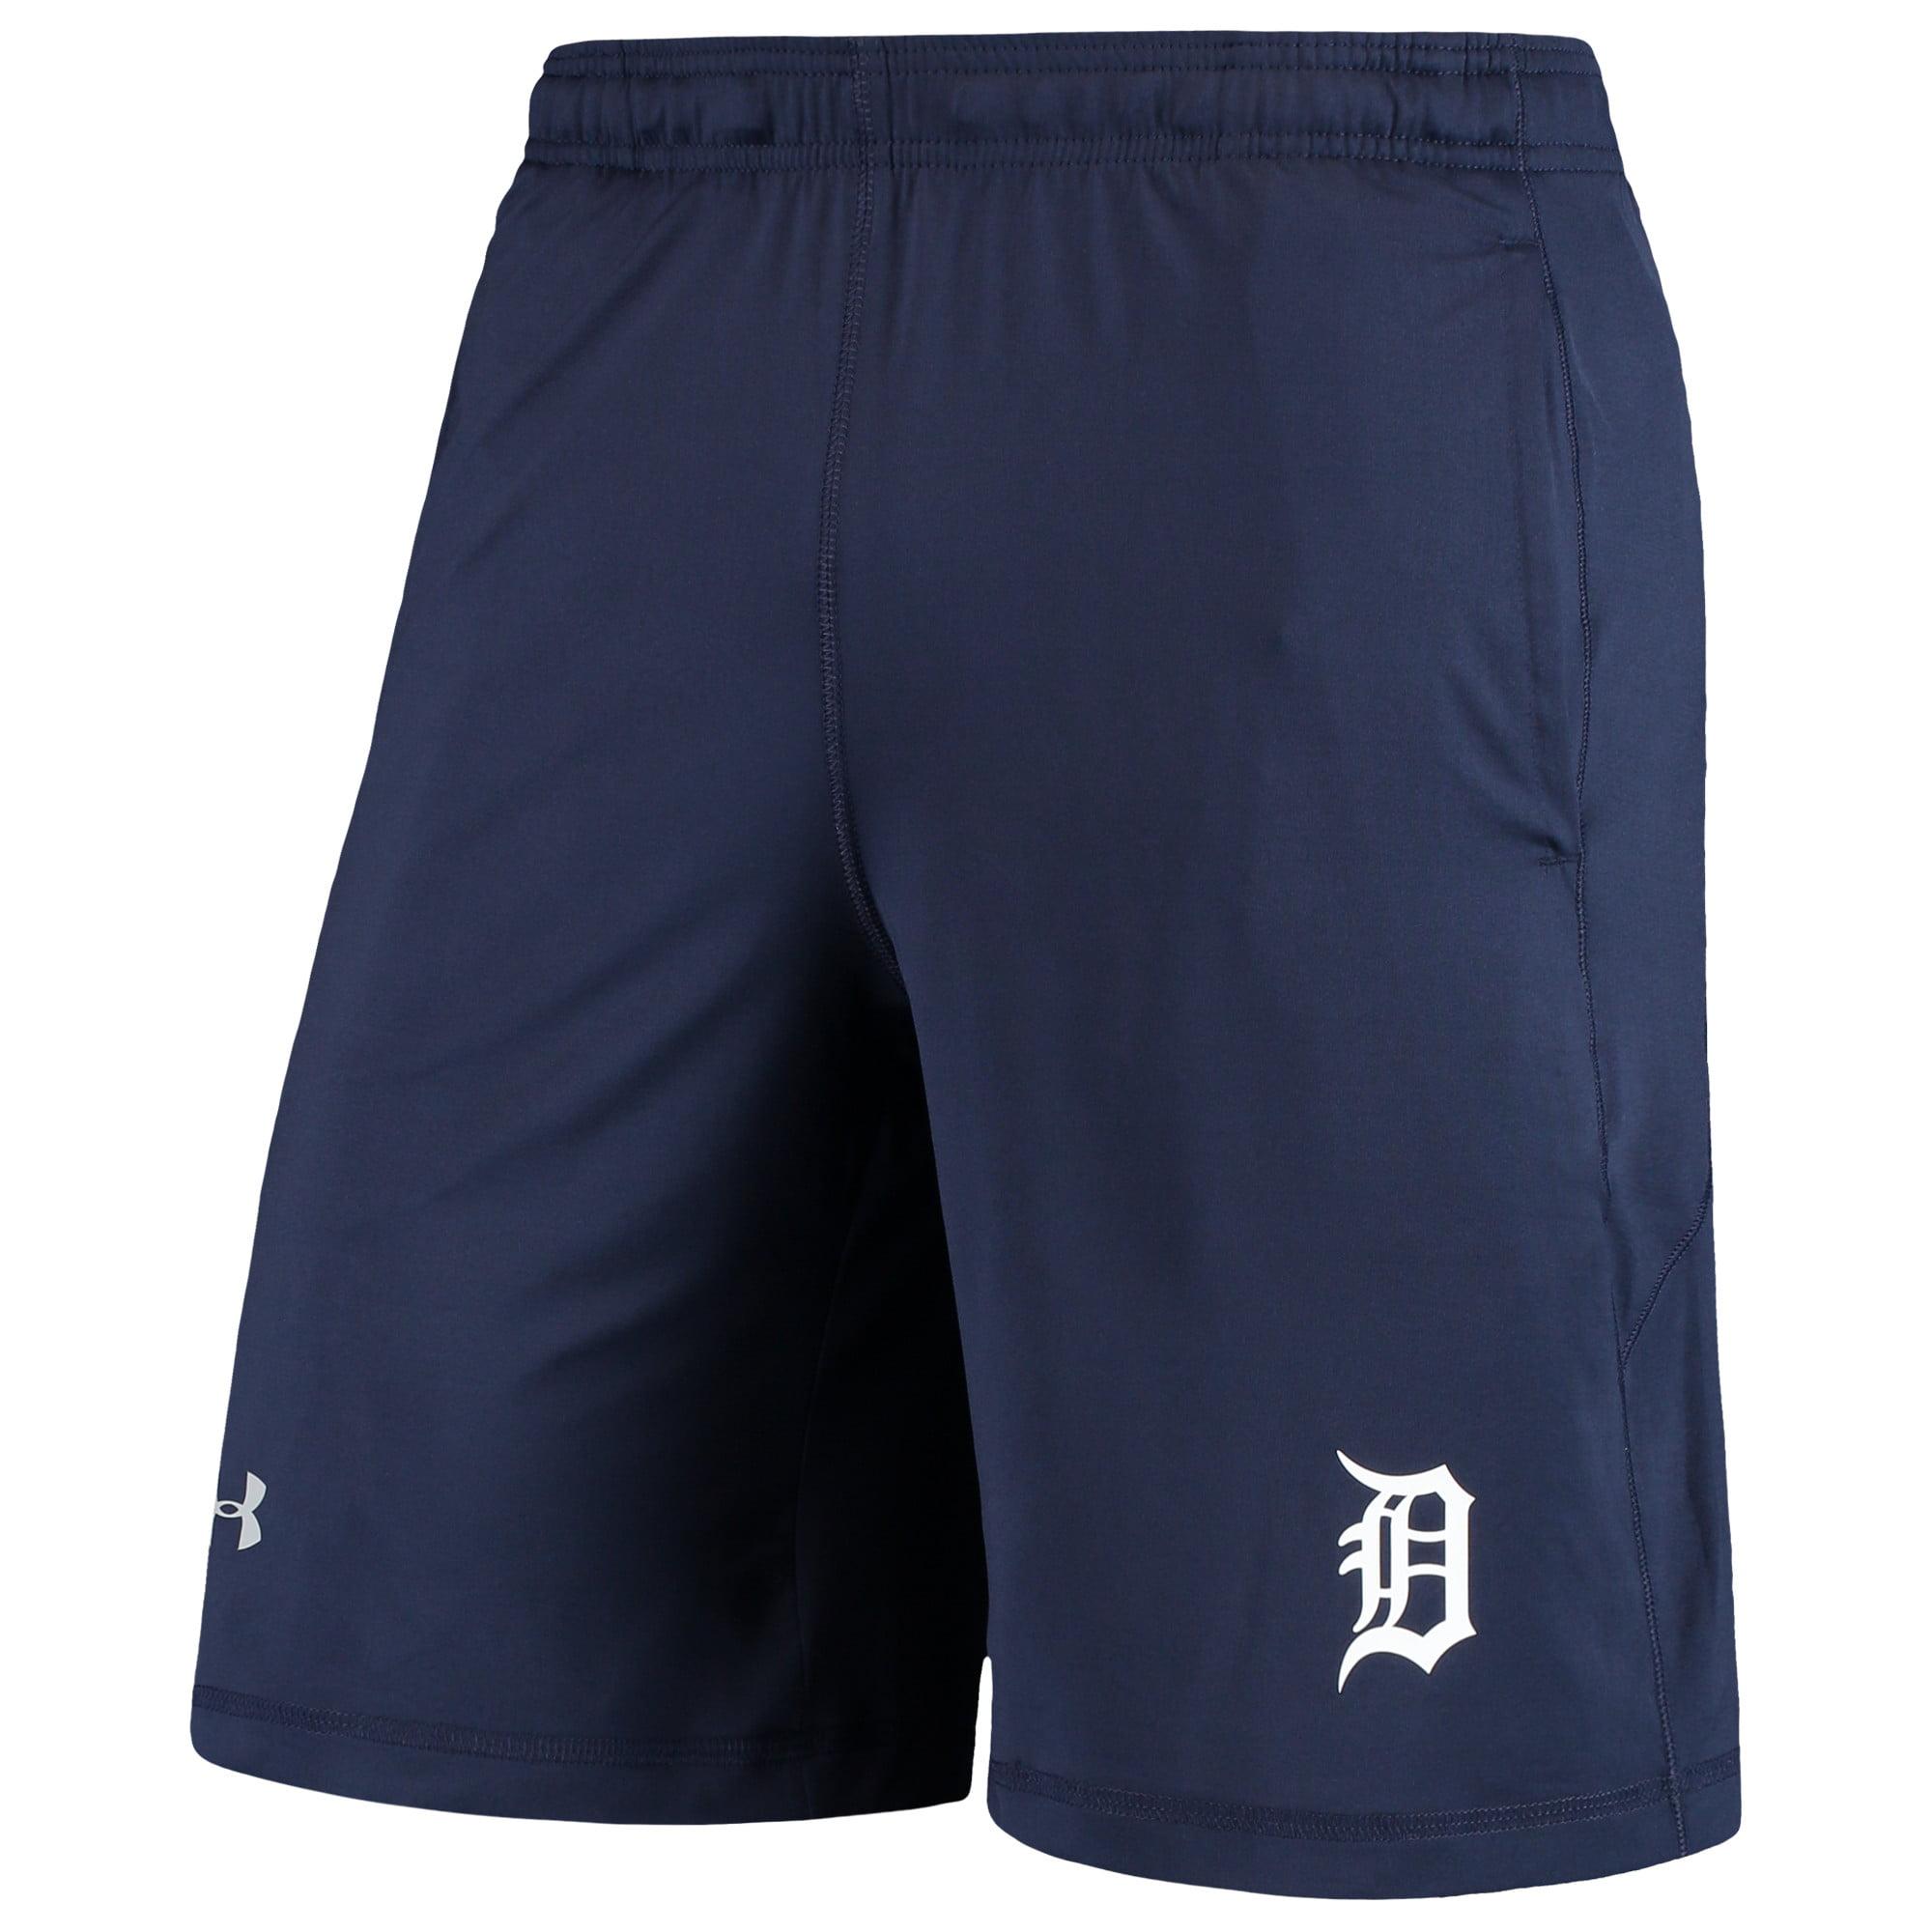 Detroit Tigers Under Armour Raid Left Leg Performance Shorts - Navy